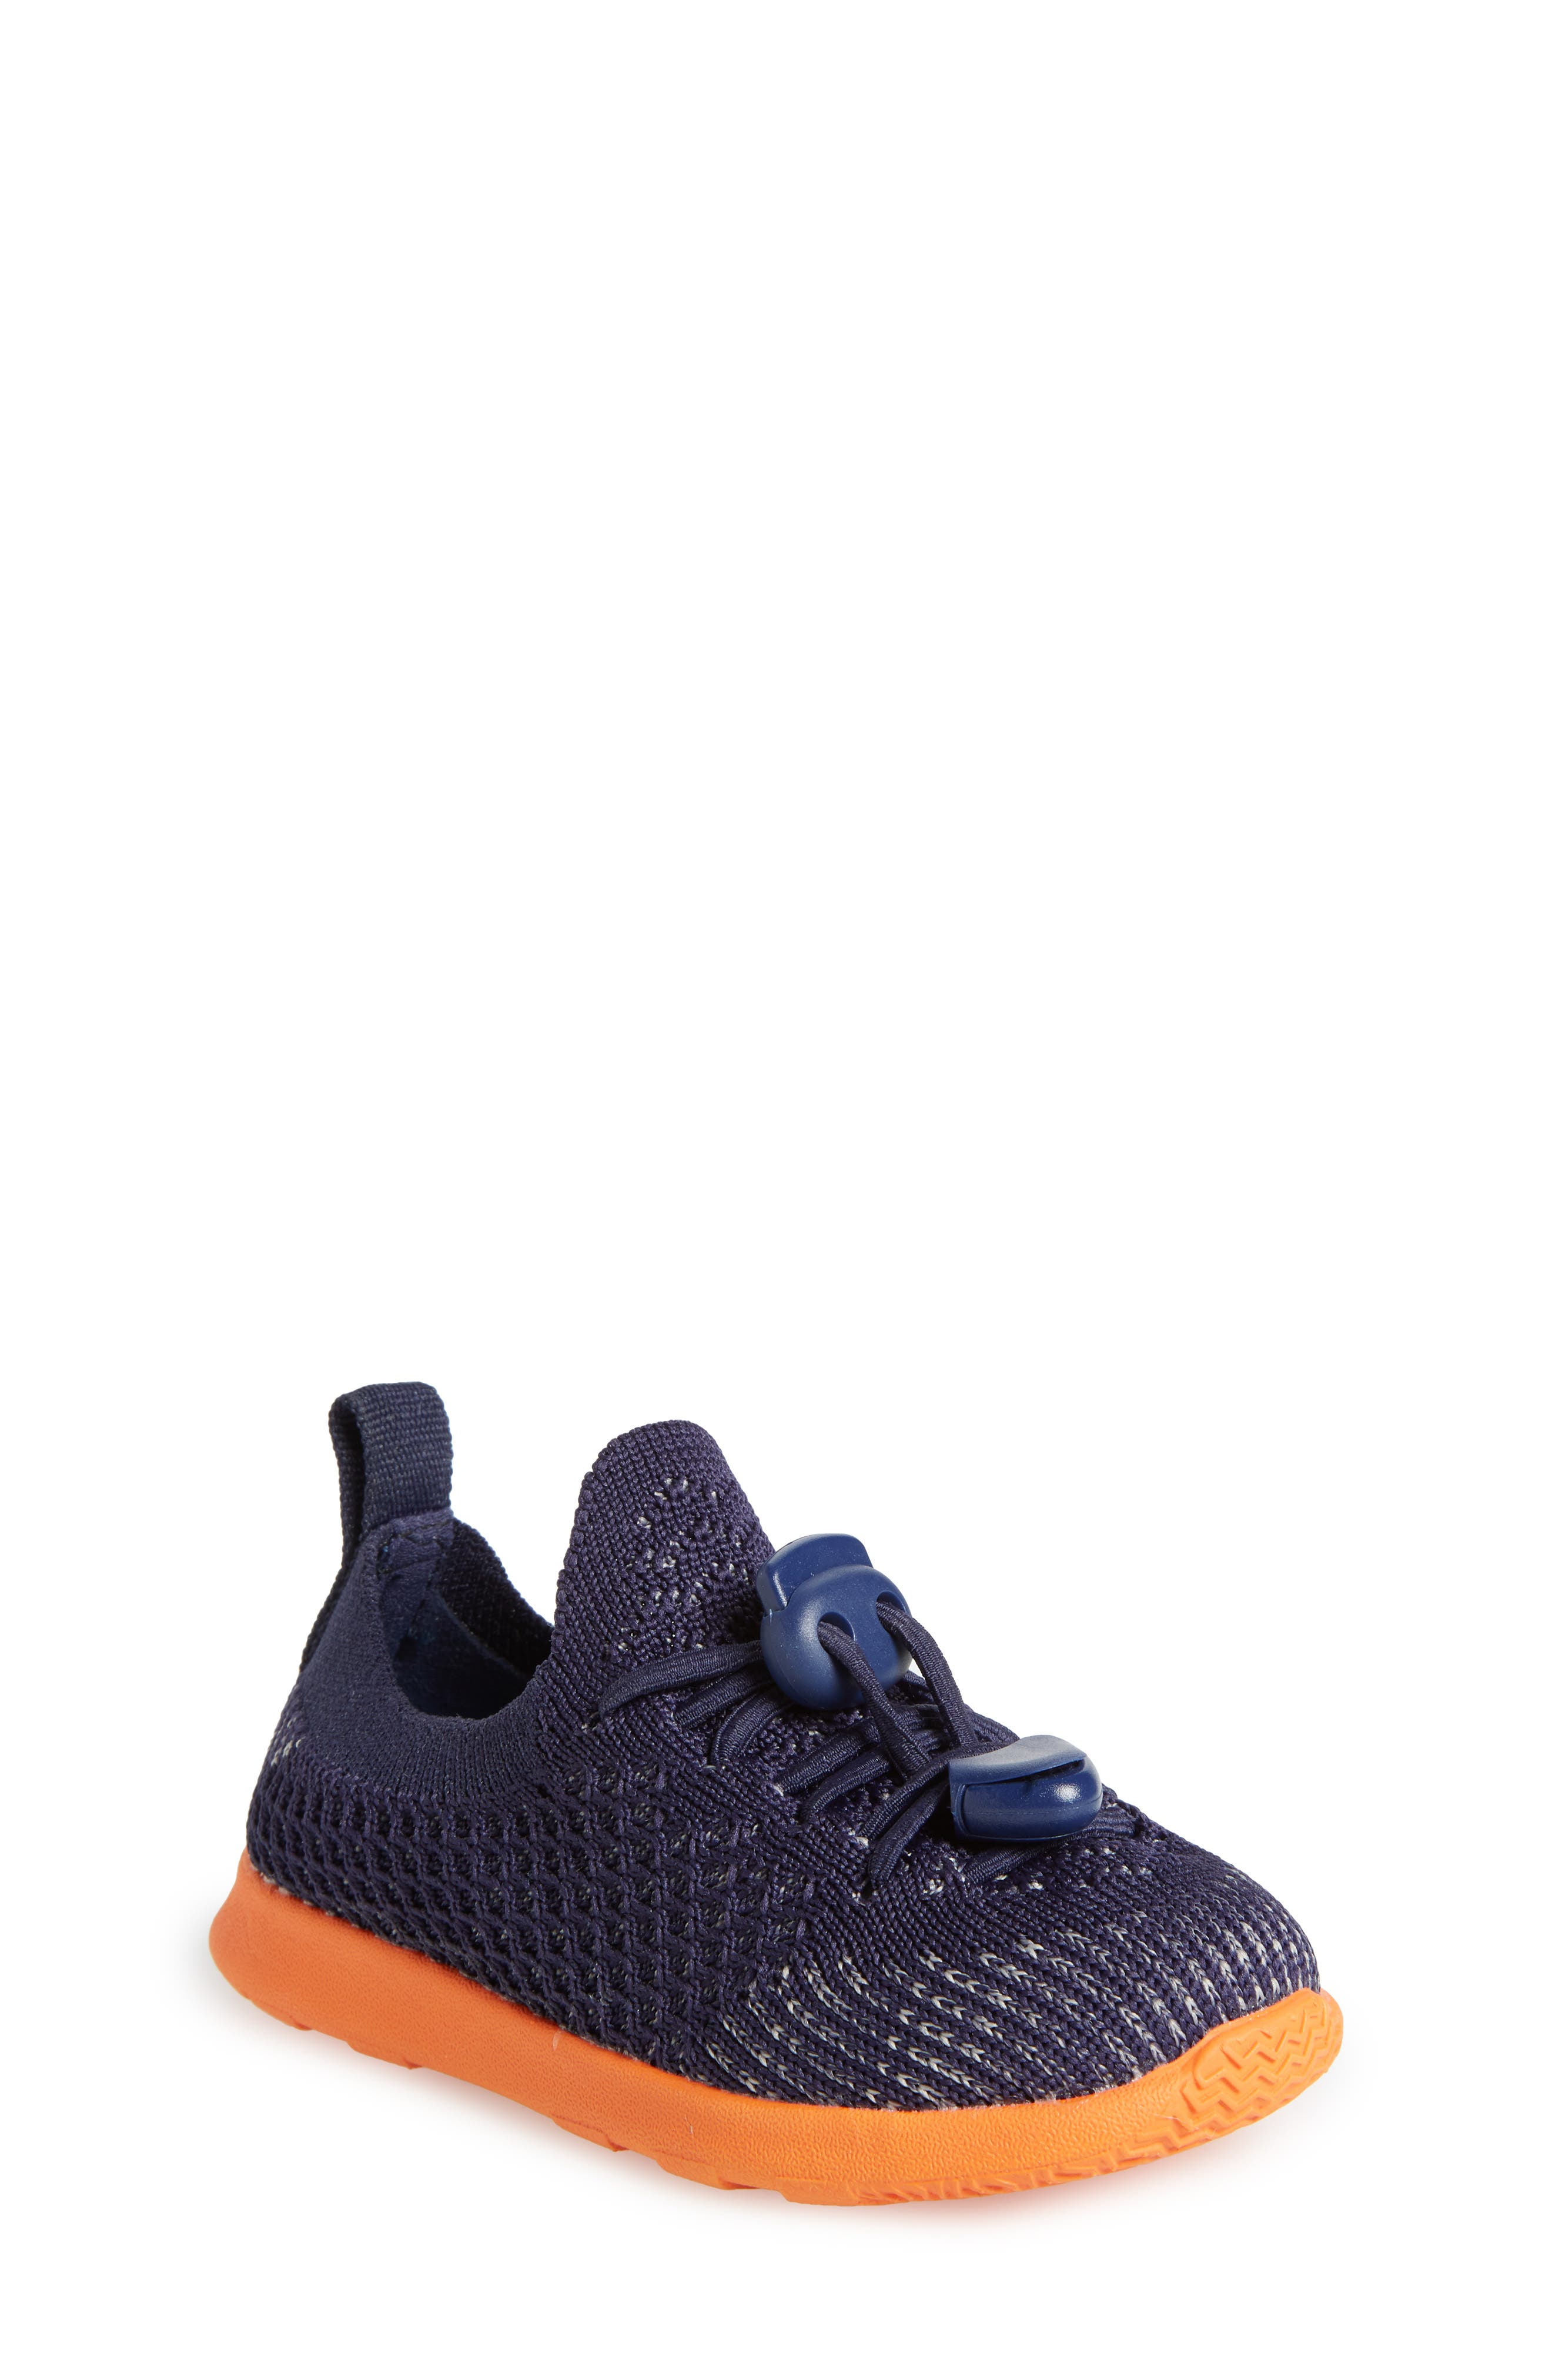 AP Mercury LiteKnit Sneaker,                             Main thumbnail 1, color,                             REGATTA BLUE/ SUNSET ORANGE